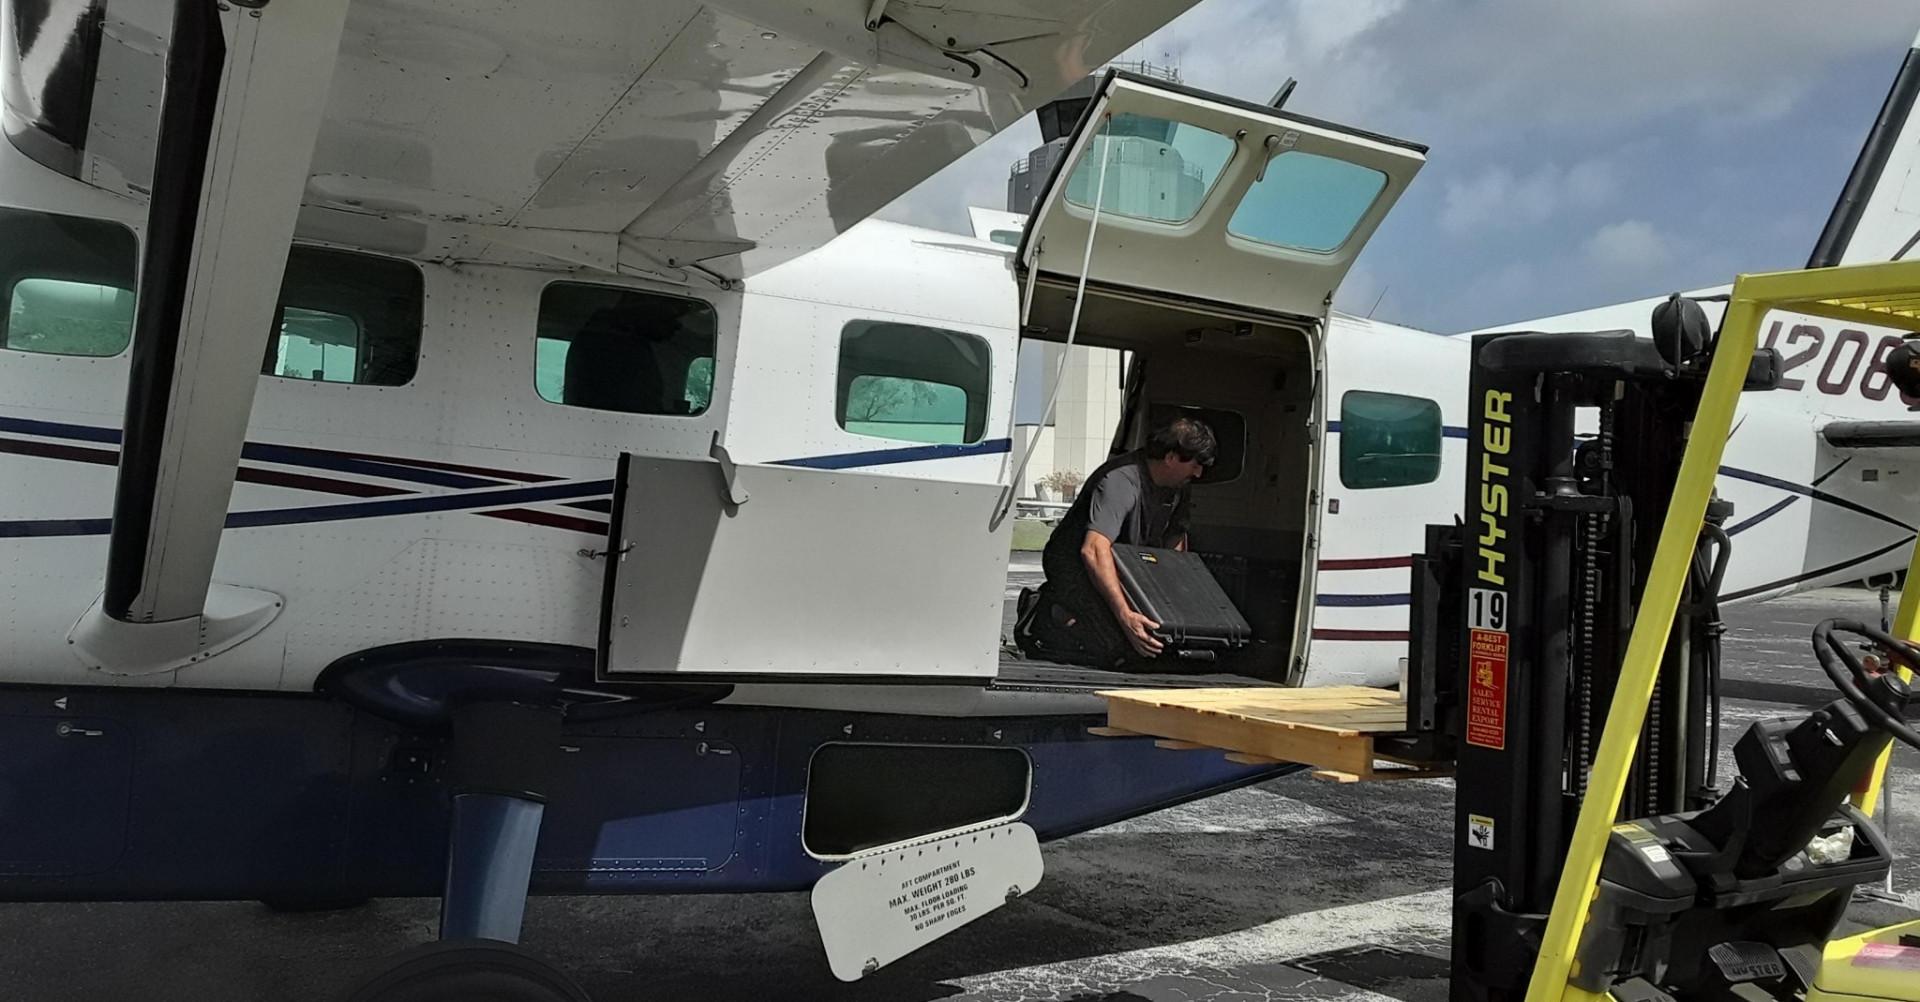 Fort Lauderdale Executive Airport (KFXE) 5